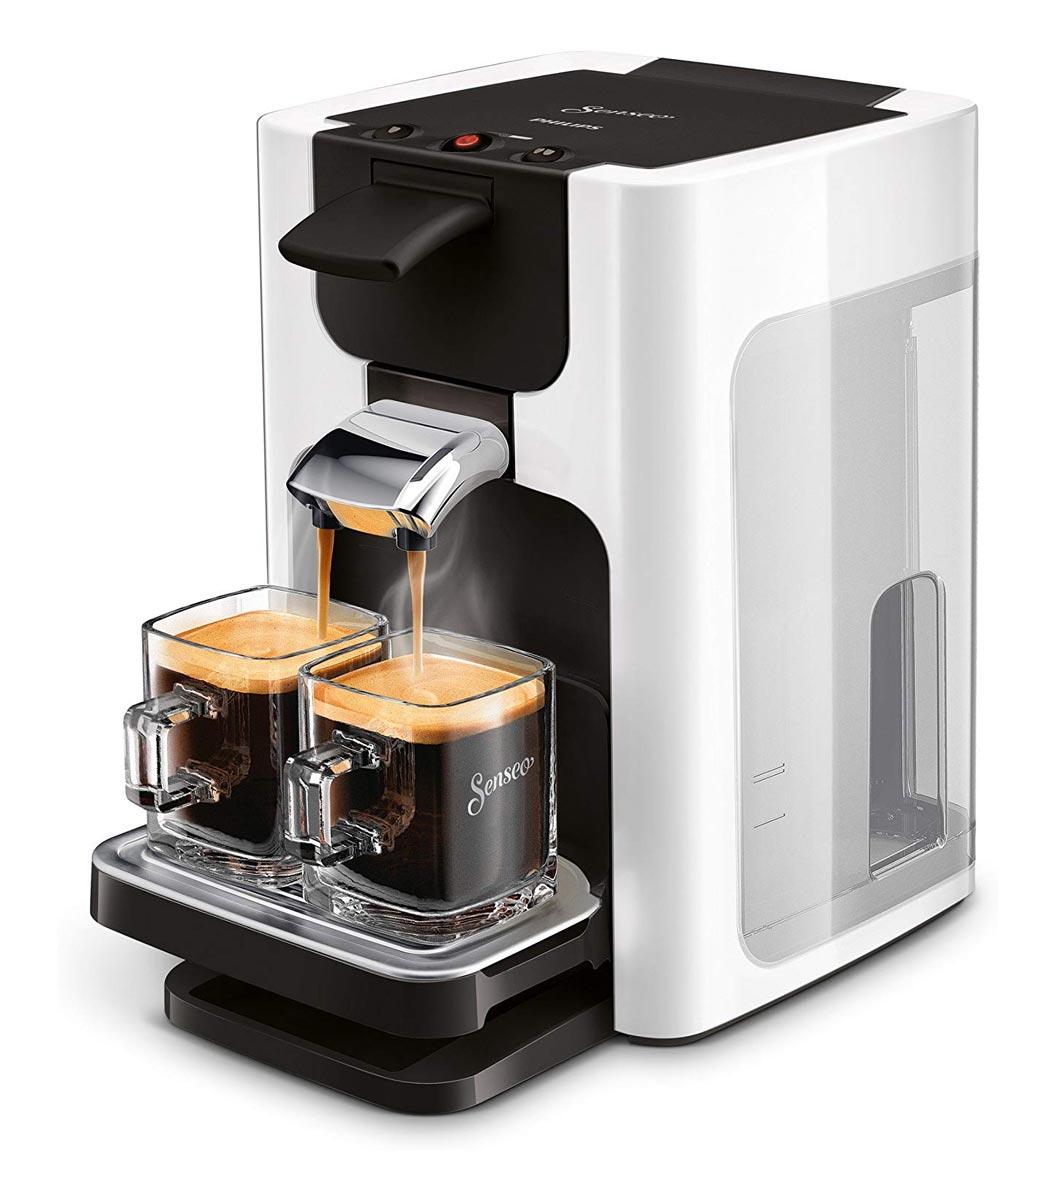 philips hd7865 senseo quadrante im test kaffeepadmaschinen test. Black Bedroom Furniture Sets. Home Design Ideas